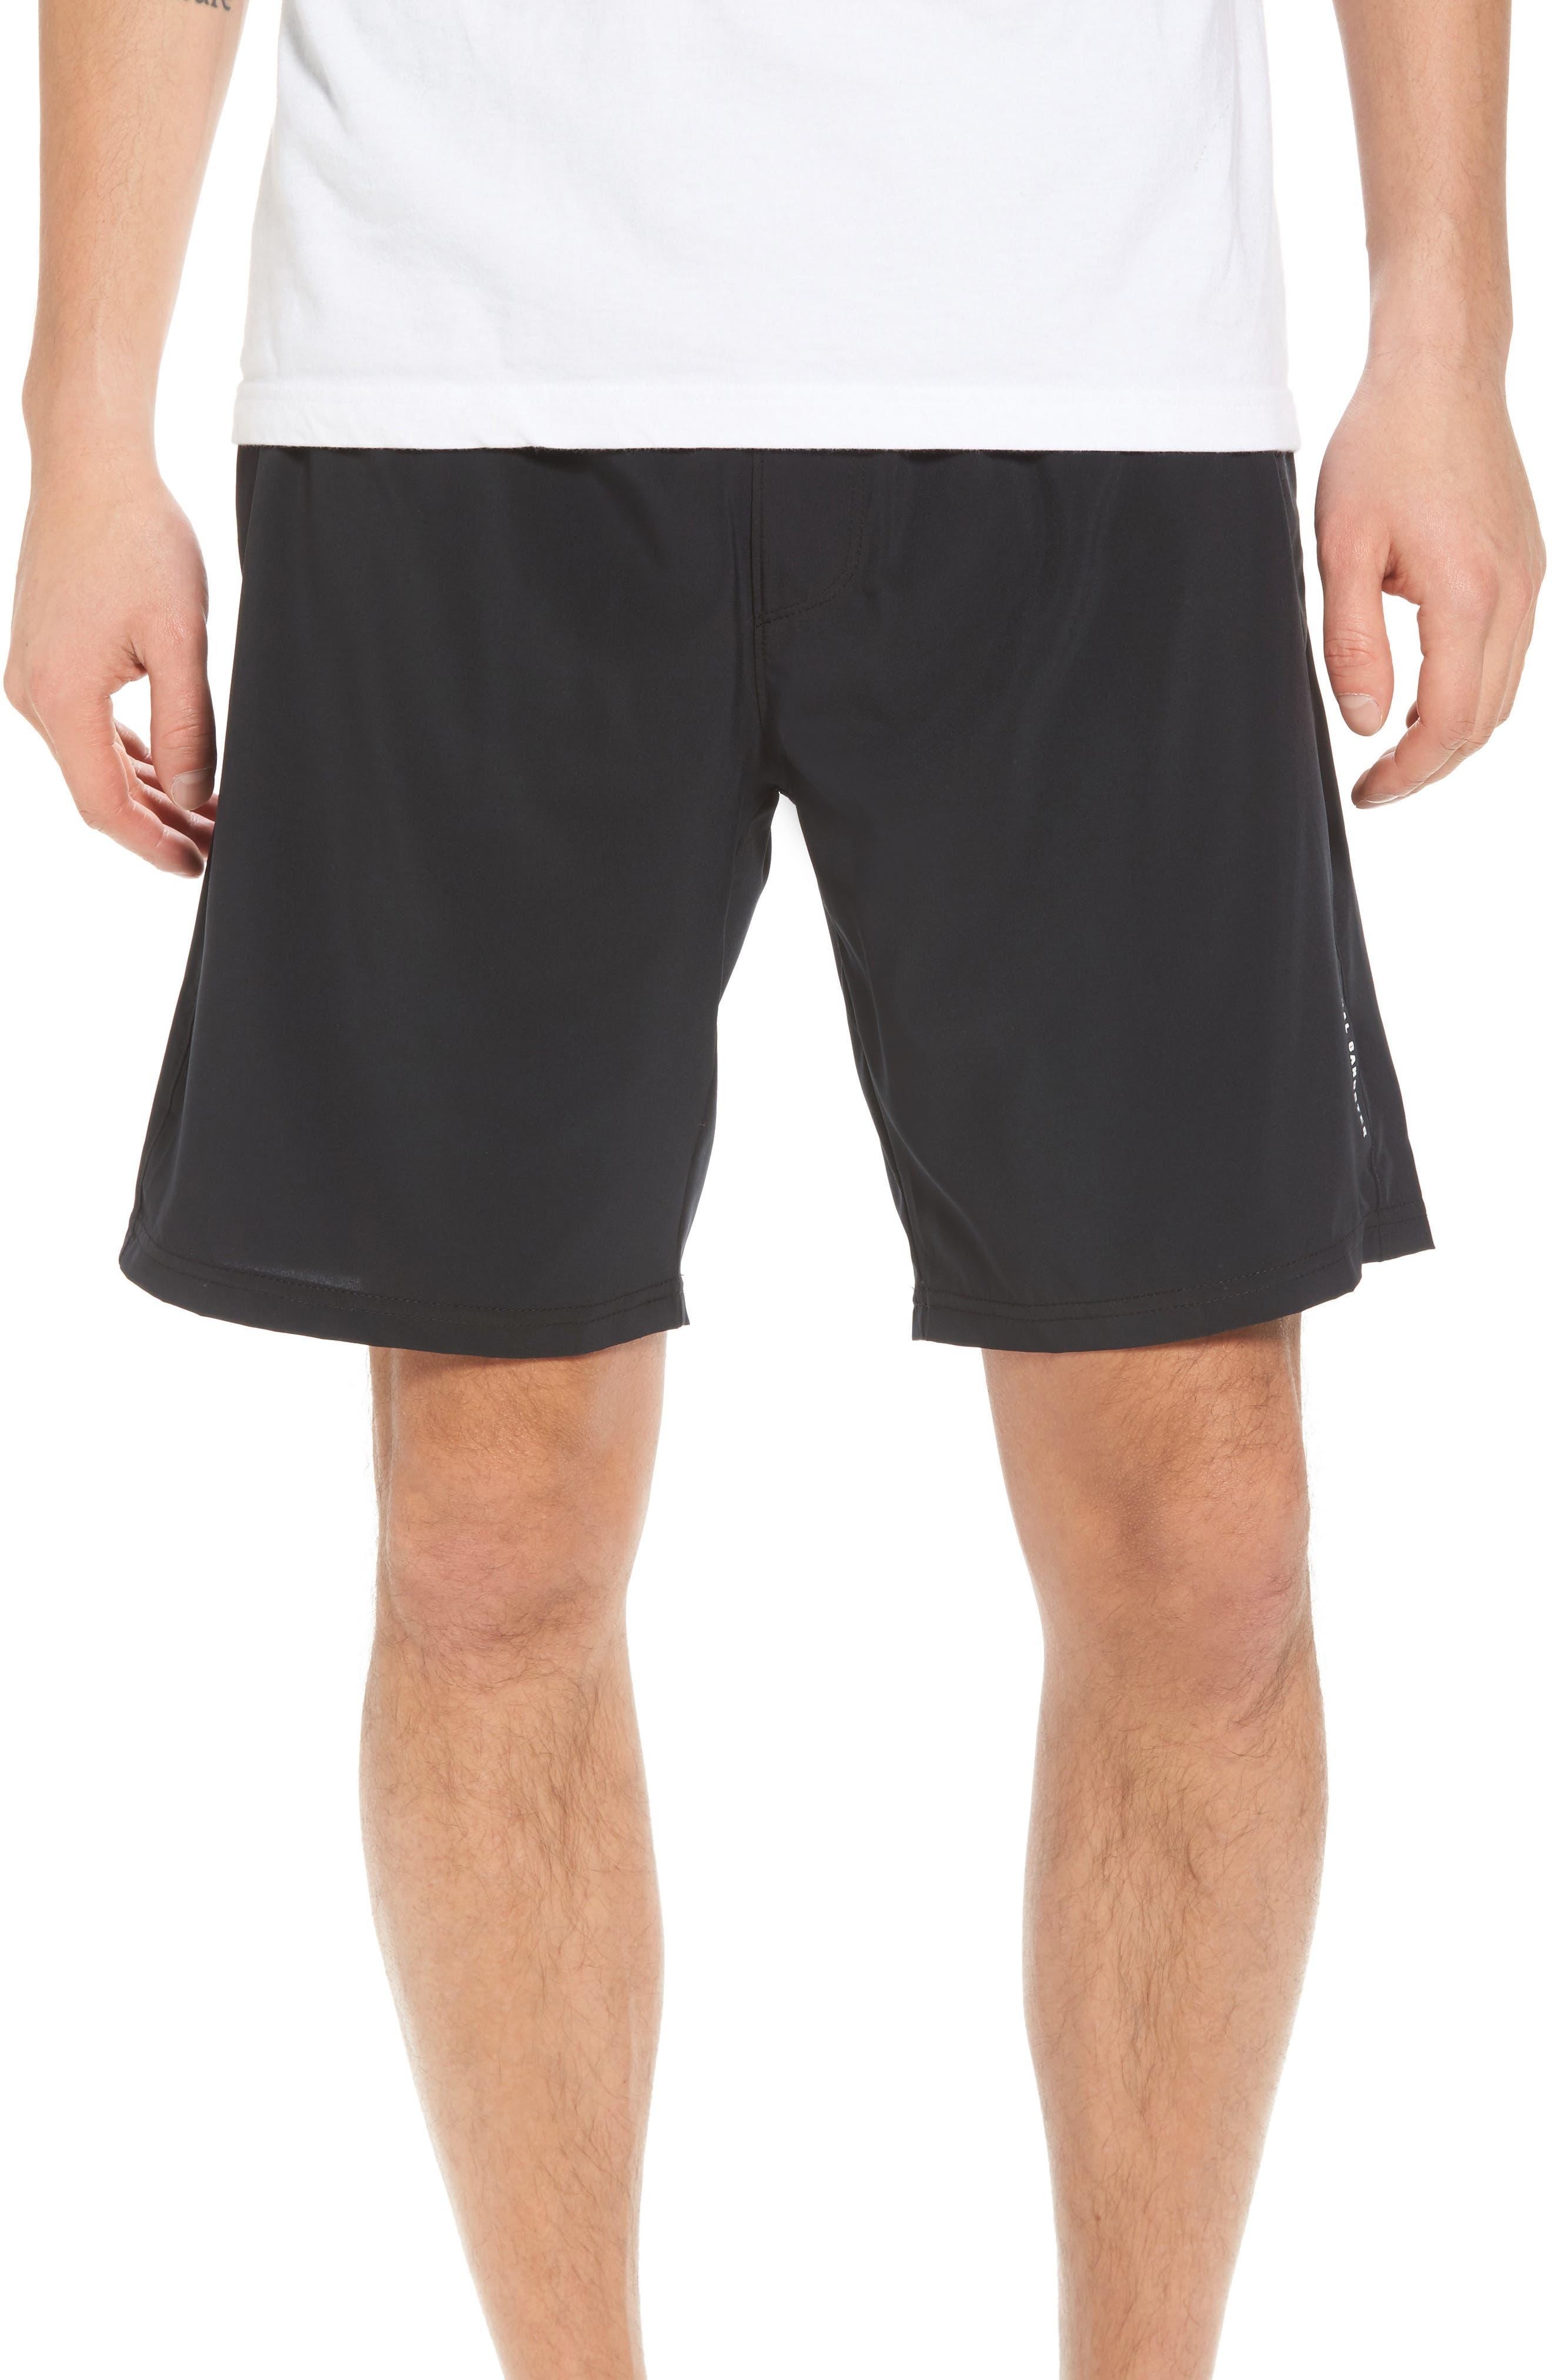 Ignite Shorts,                         Main,                         color, 001